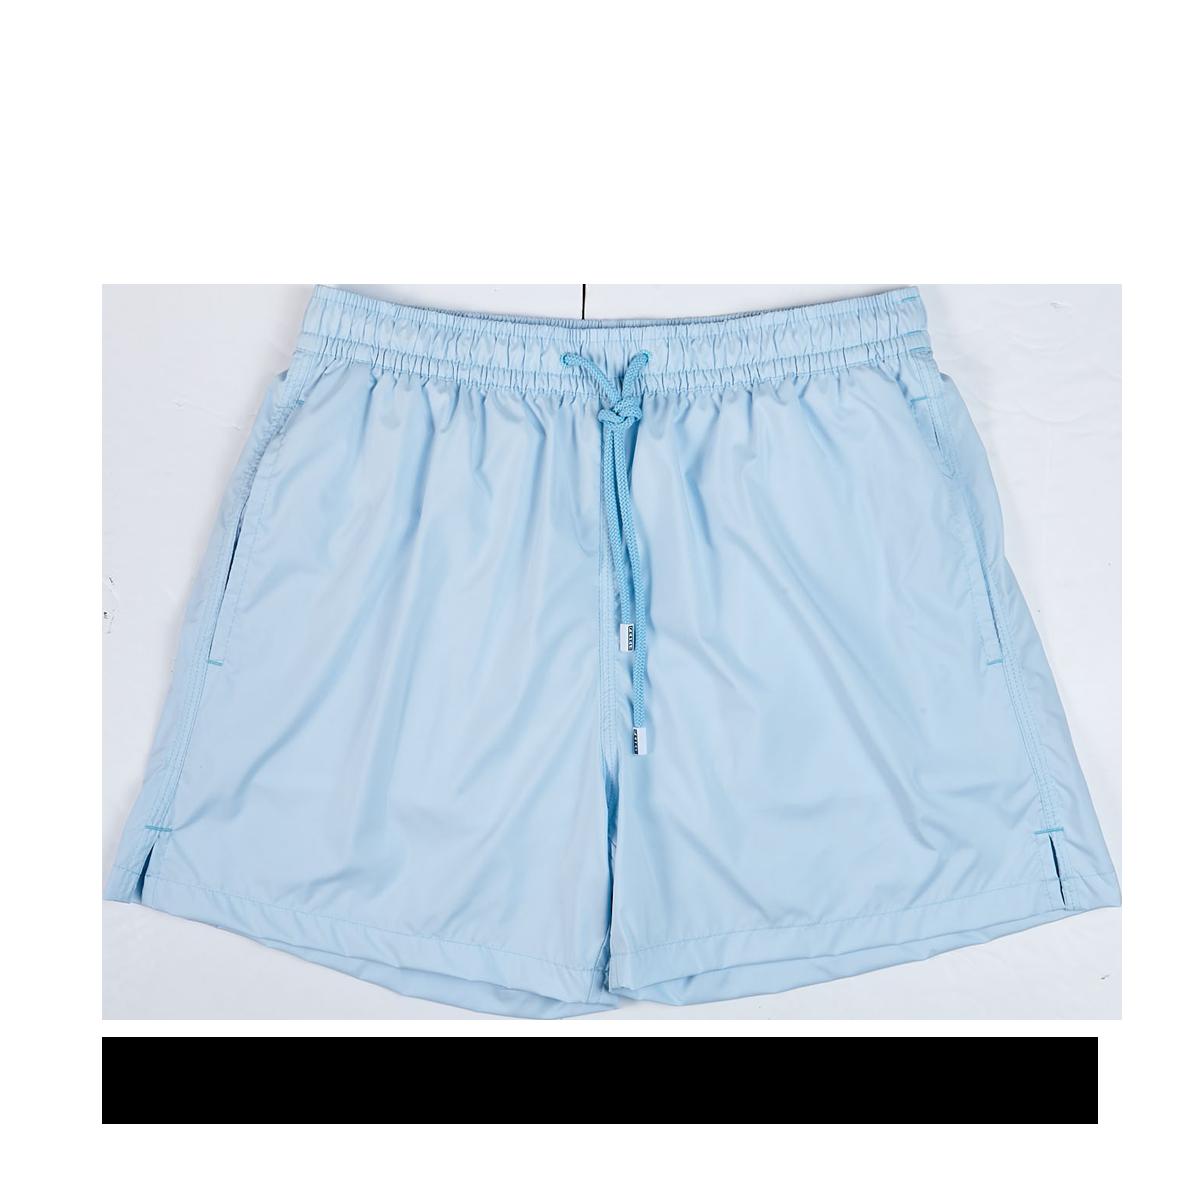 Fedeli Sky Blue Madeira Microfiber Swim Shorts Front